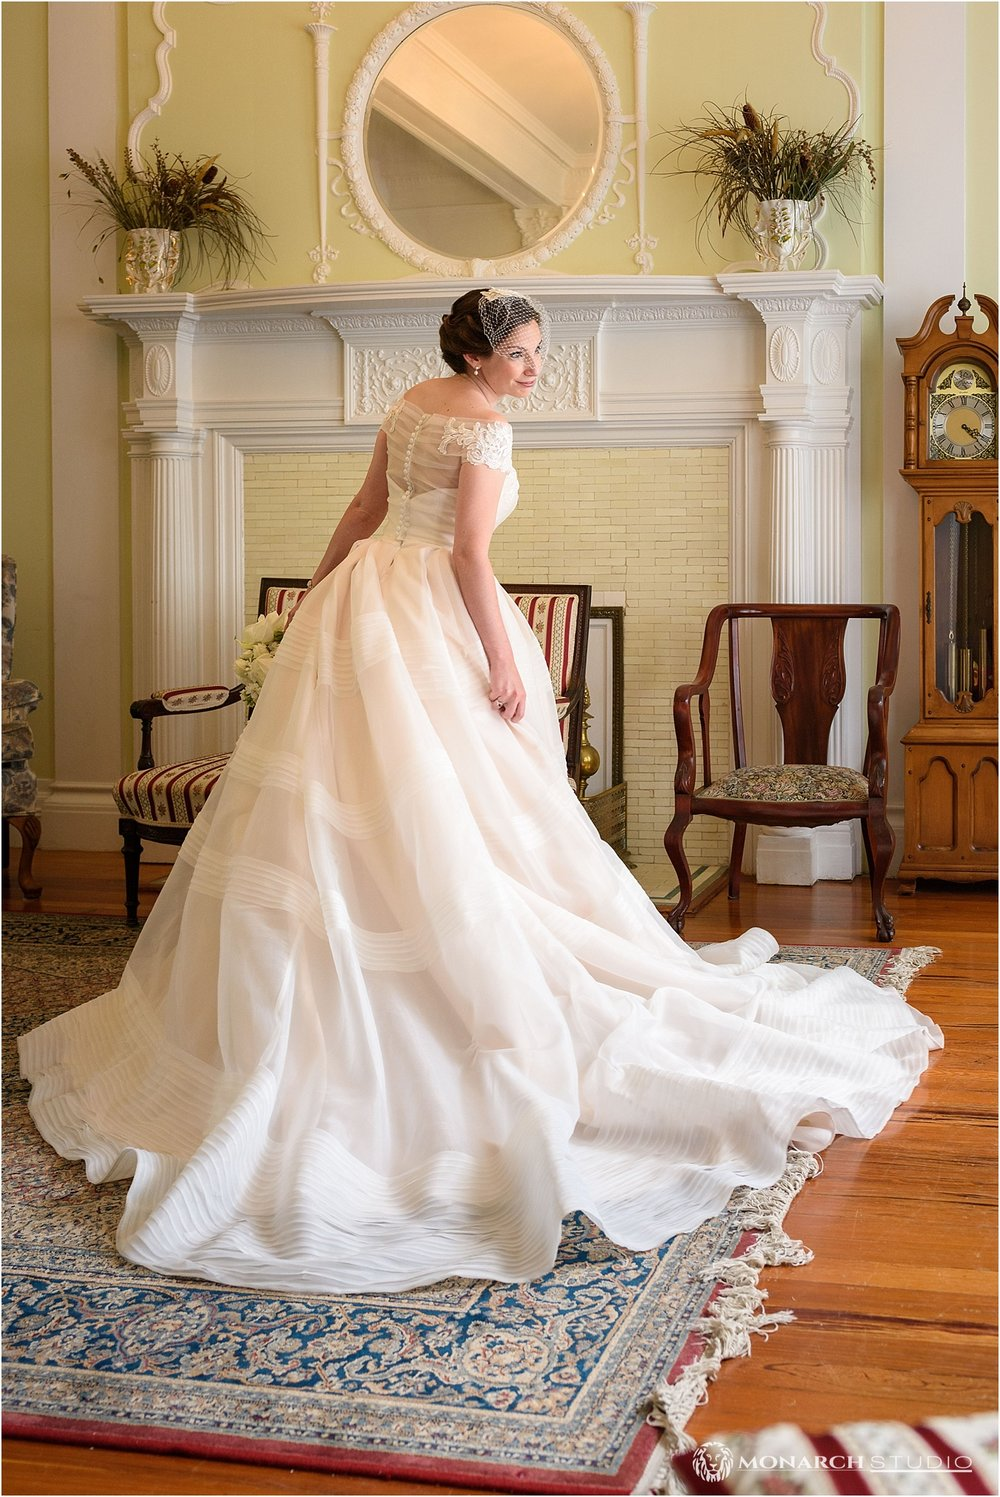 022-st-augustine-wedding-photographer-.jpg